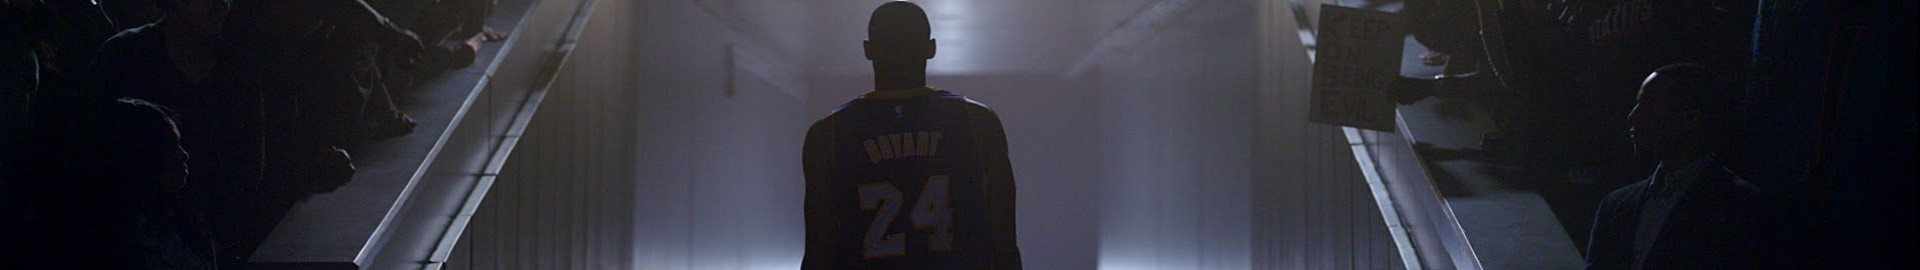 Scarpe Nike da Basket Uomo/Donna/Bambino | Basket Zone Siena